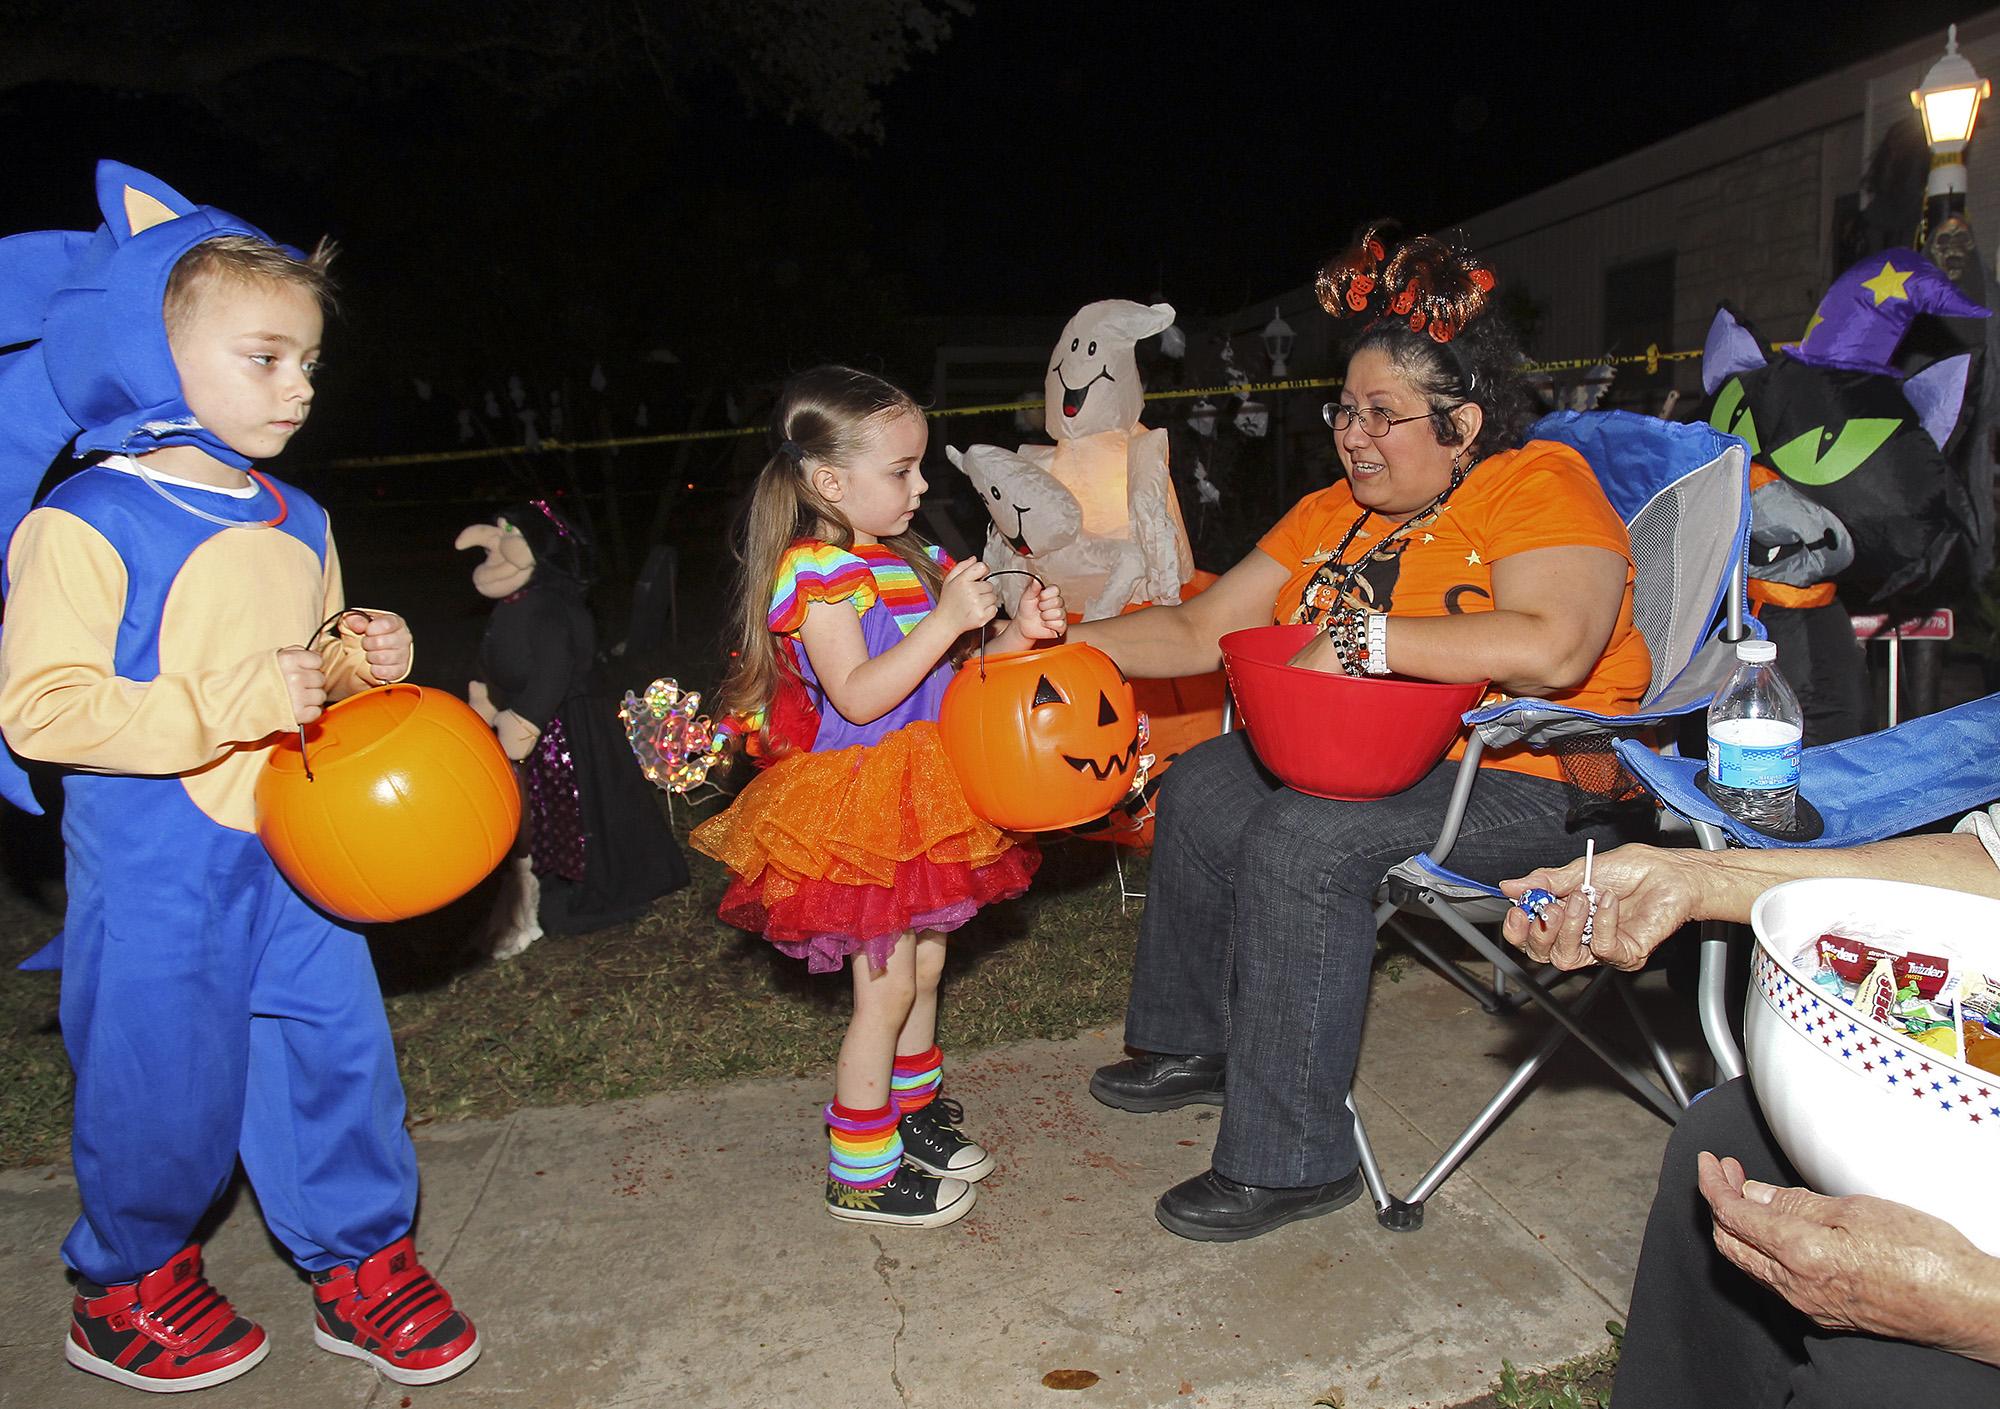 10 great neighborhoods for trick-or-treating in San Antonio